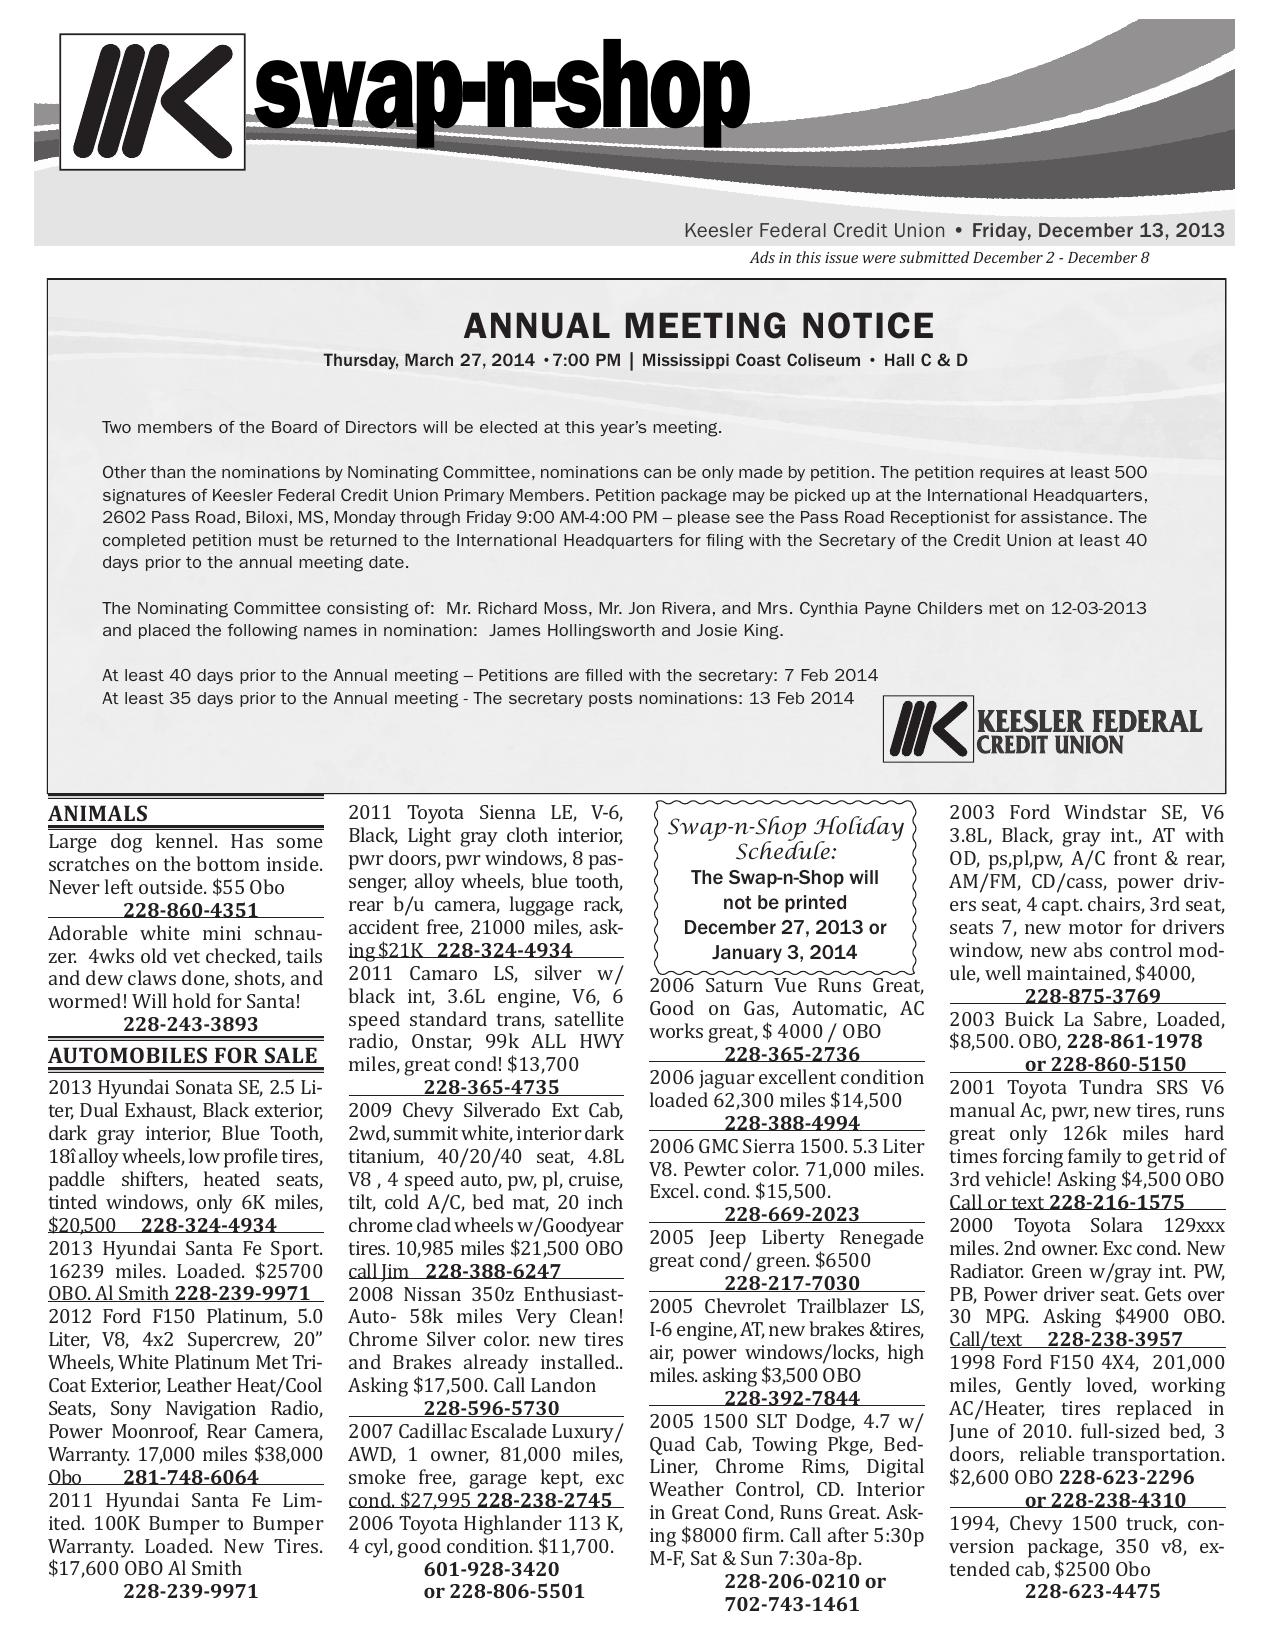 swap-n-shop - Keesler Federal Credit Union   manualzz com